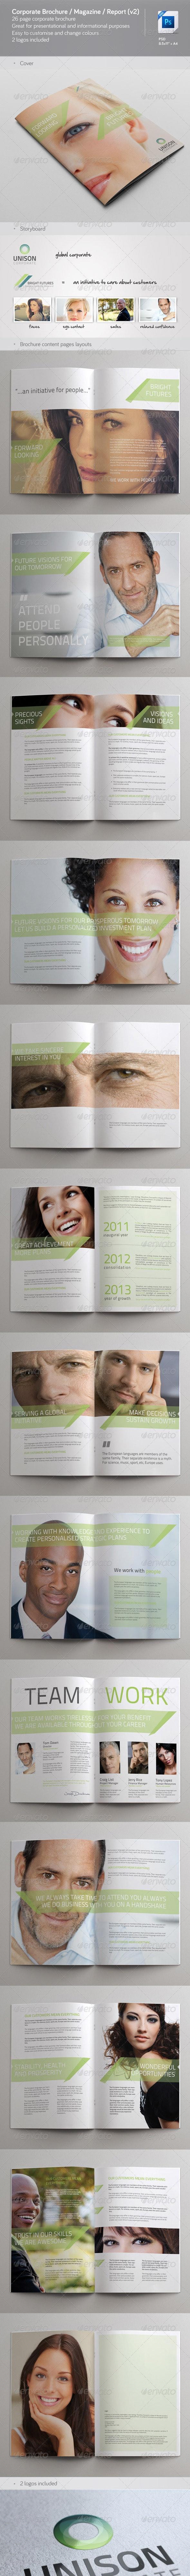 Corporate Brochure / Magazine / Report (v2) - Corporate Brochures